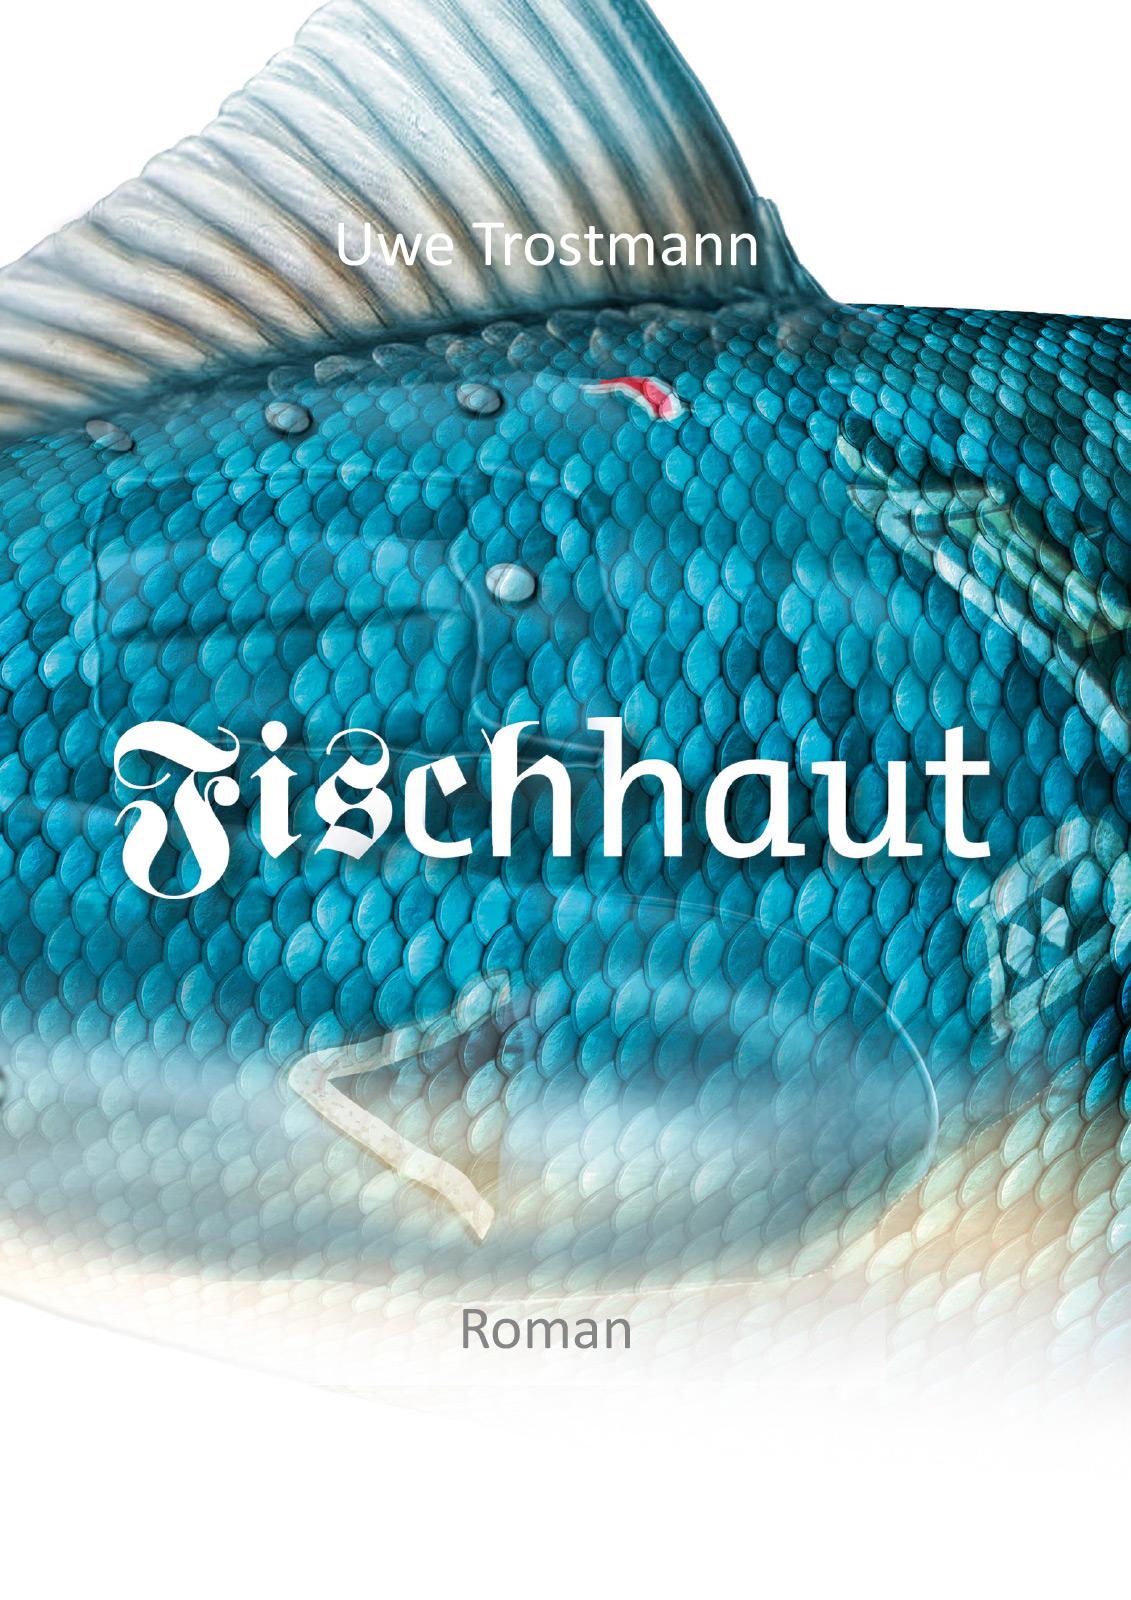 Buchcover_Fischhaut_UweTrostmann_Autor